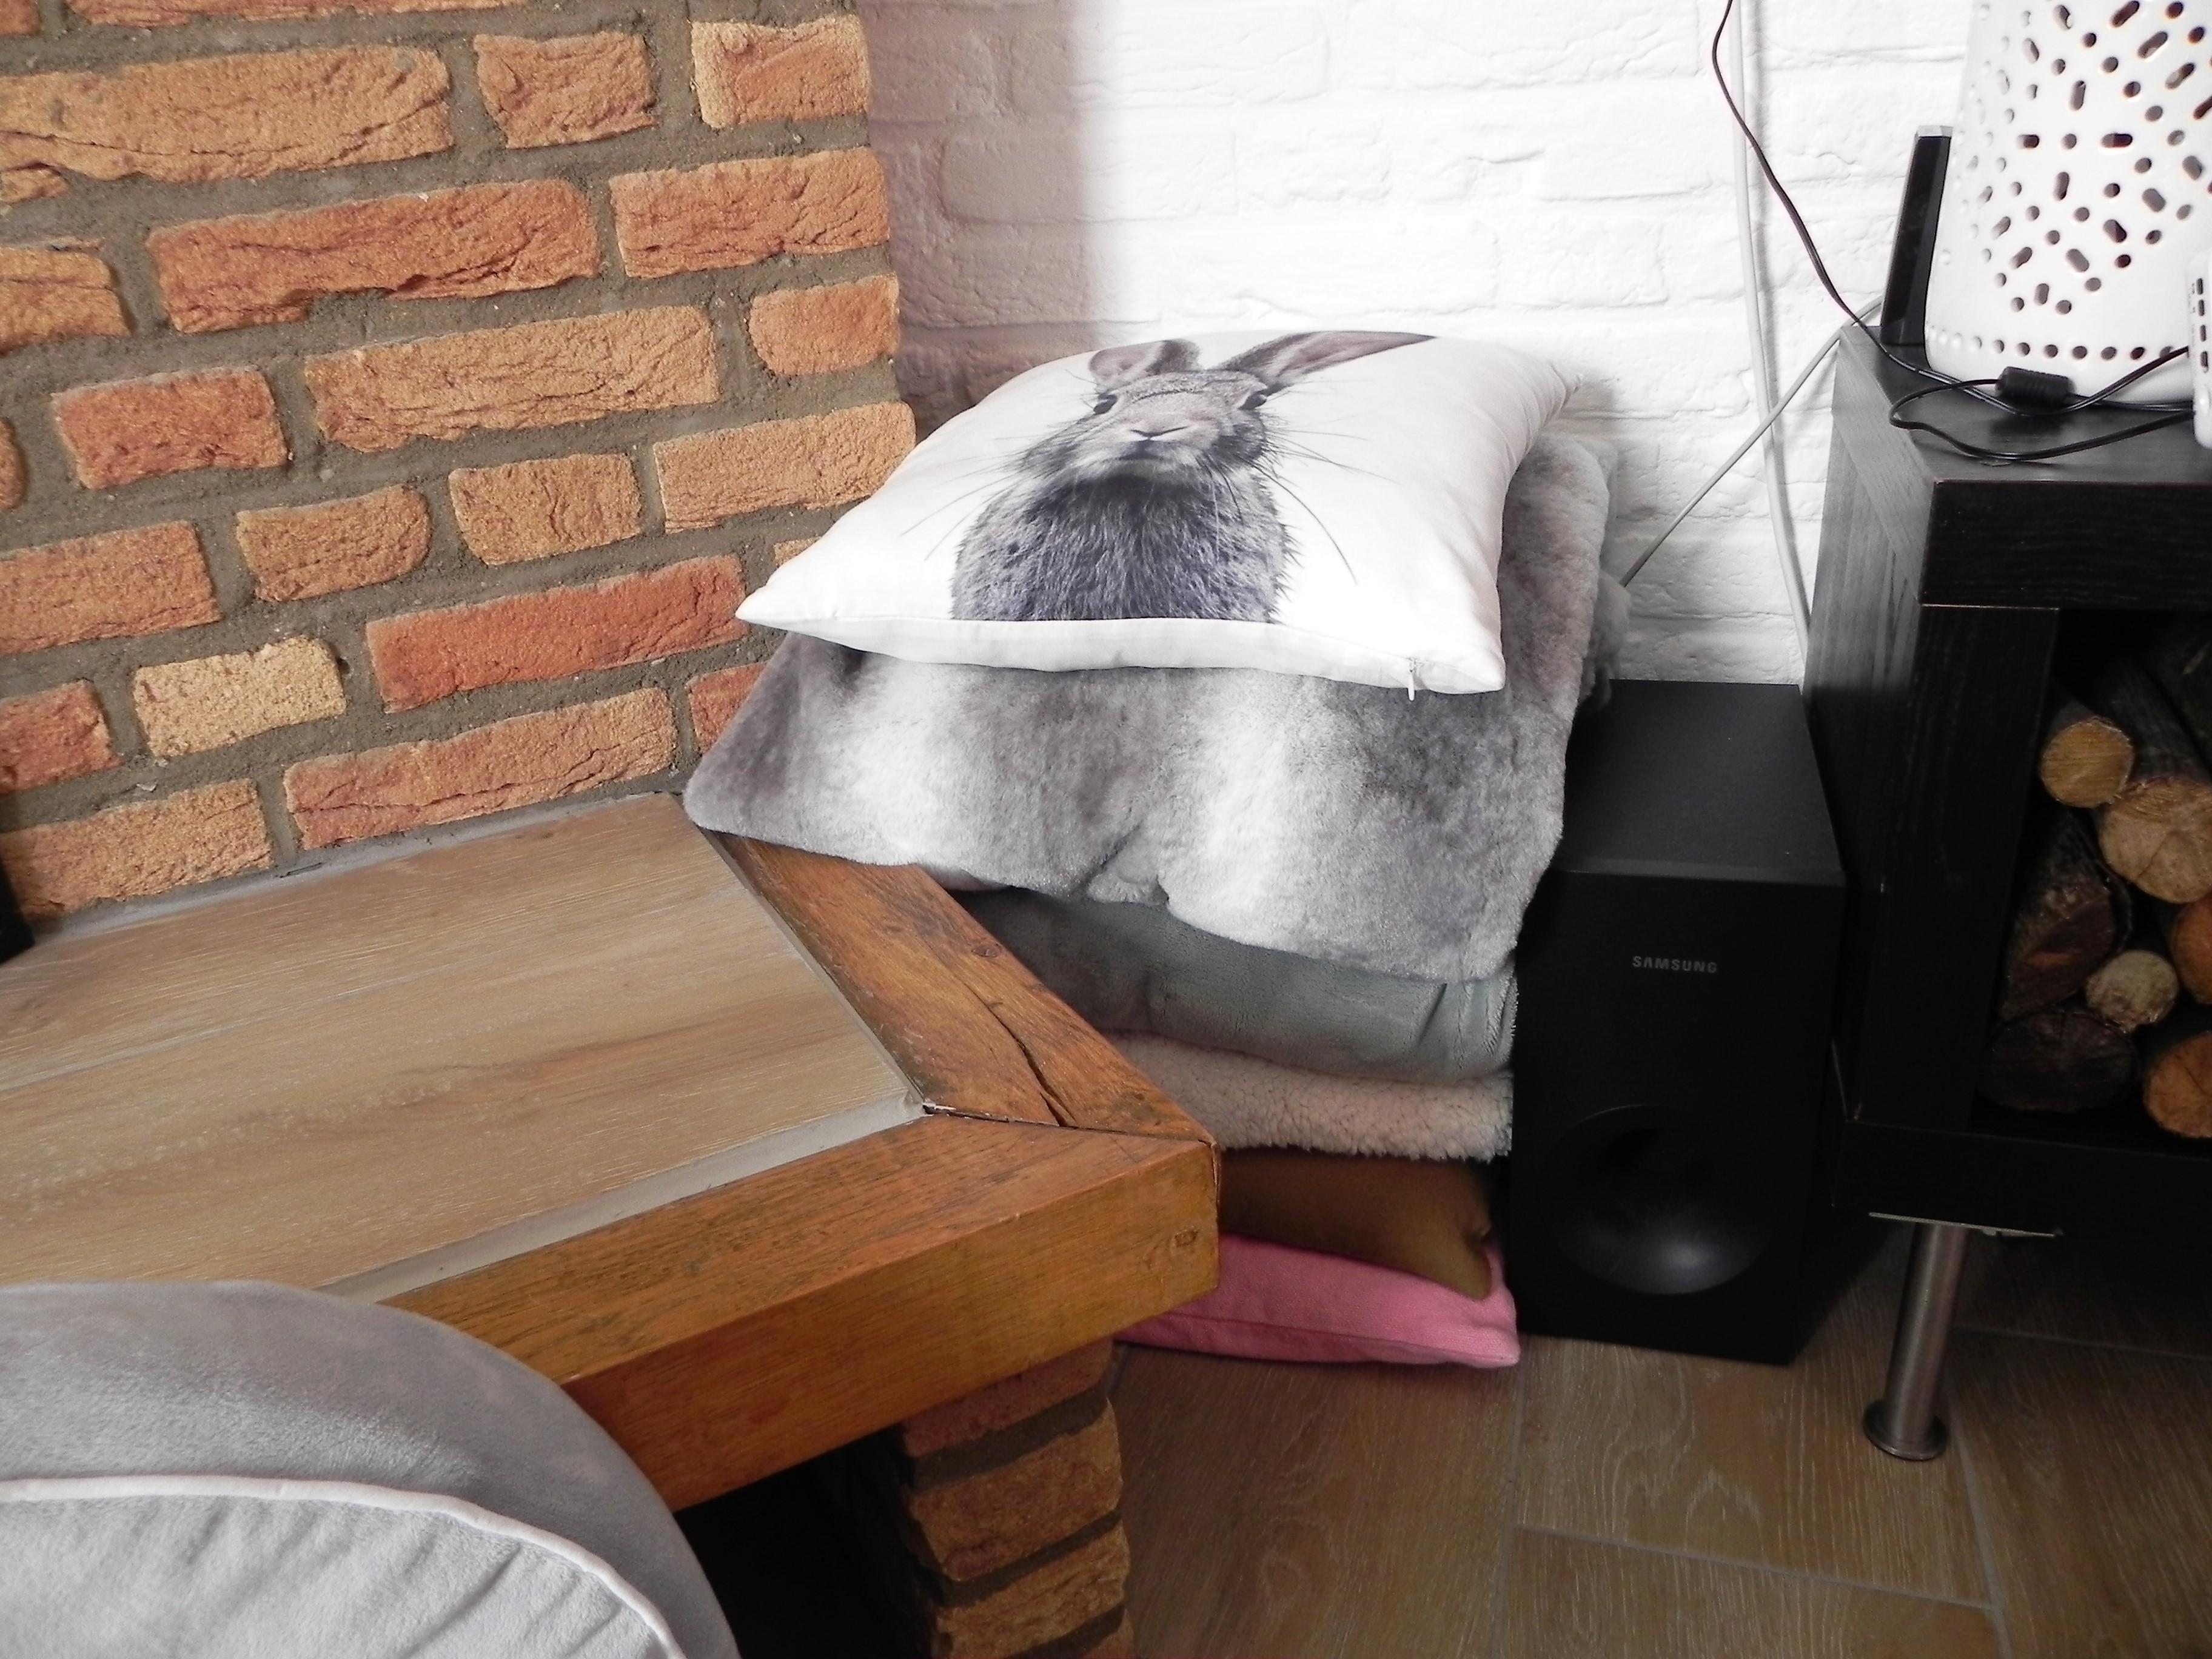 woondeken, plaid, wonen, woonkamer, interieur, binnenkijken, home, blog, woonblog, dekbeddiscounter.nl, mamablog, mamalifestyle blog, La Log.nl